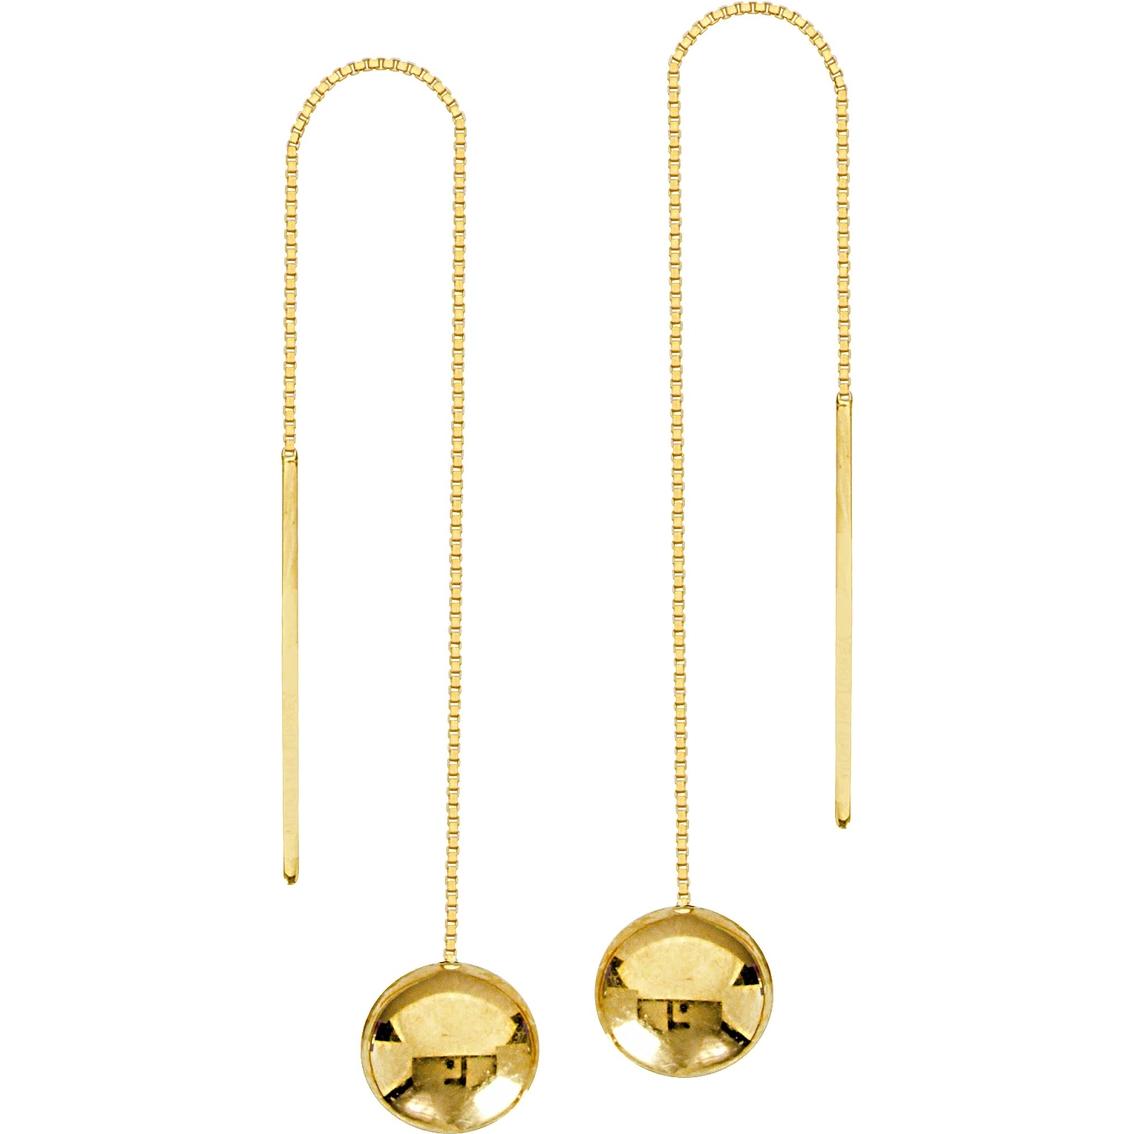 14k Yellow Gold 65mm Ball Bead Threader Earrings